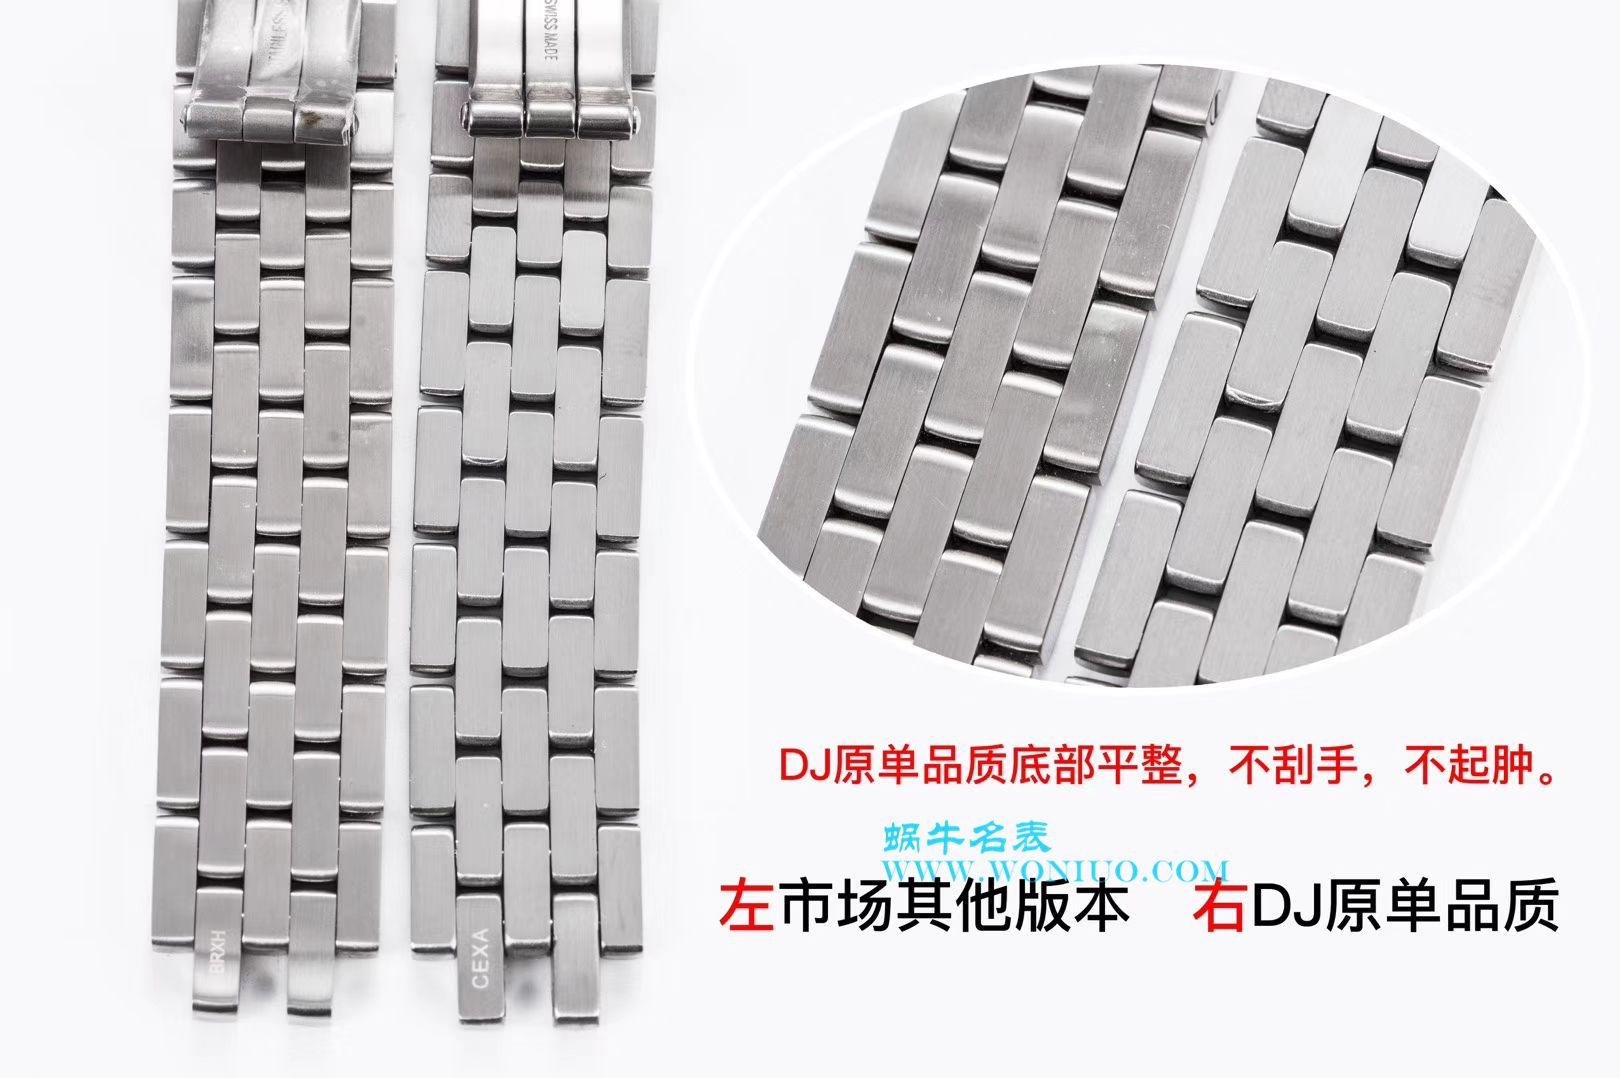 DJ Factory 卡地亚猎豹系列腕表--型号WSPN0007 PANTHÈRE DE CARTIER系列卡地亚猎豹腕表